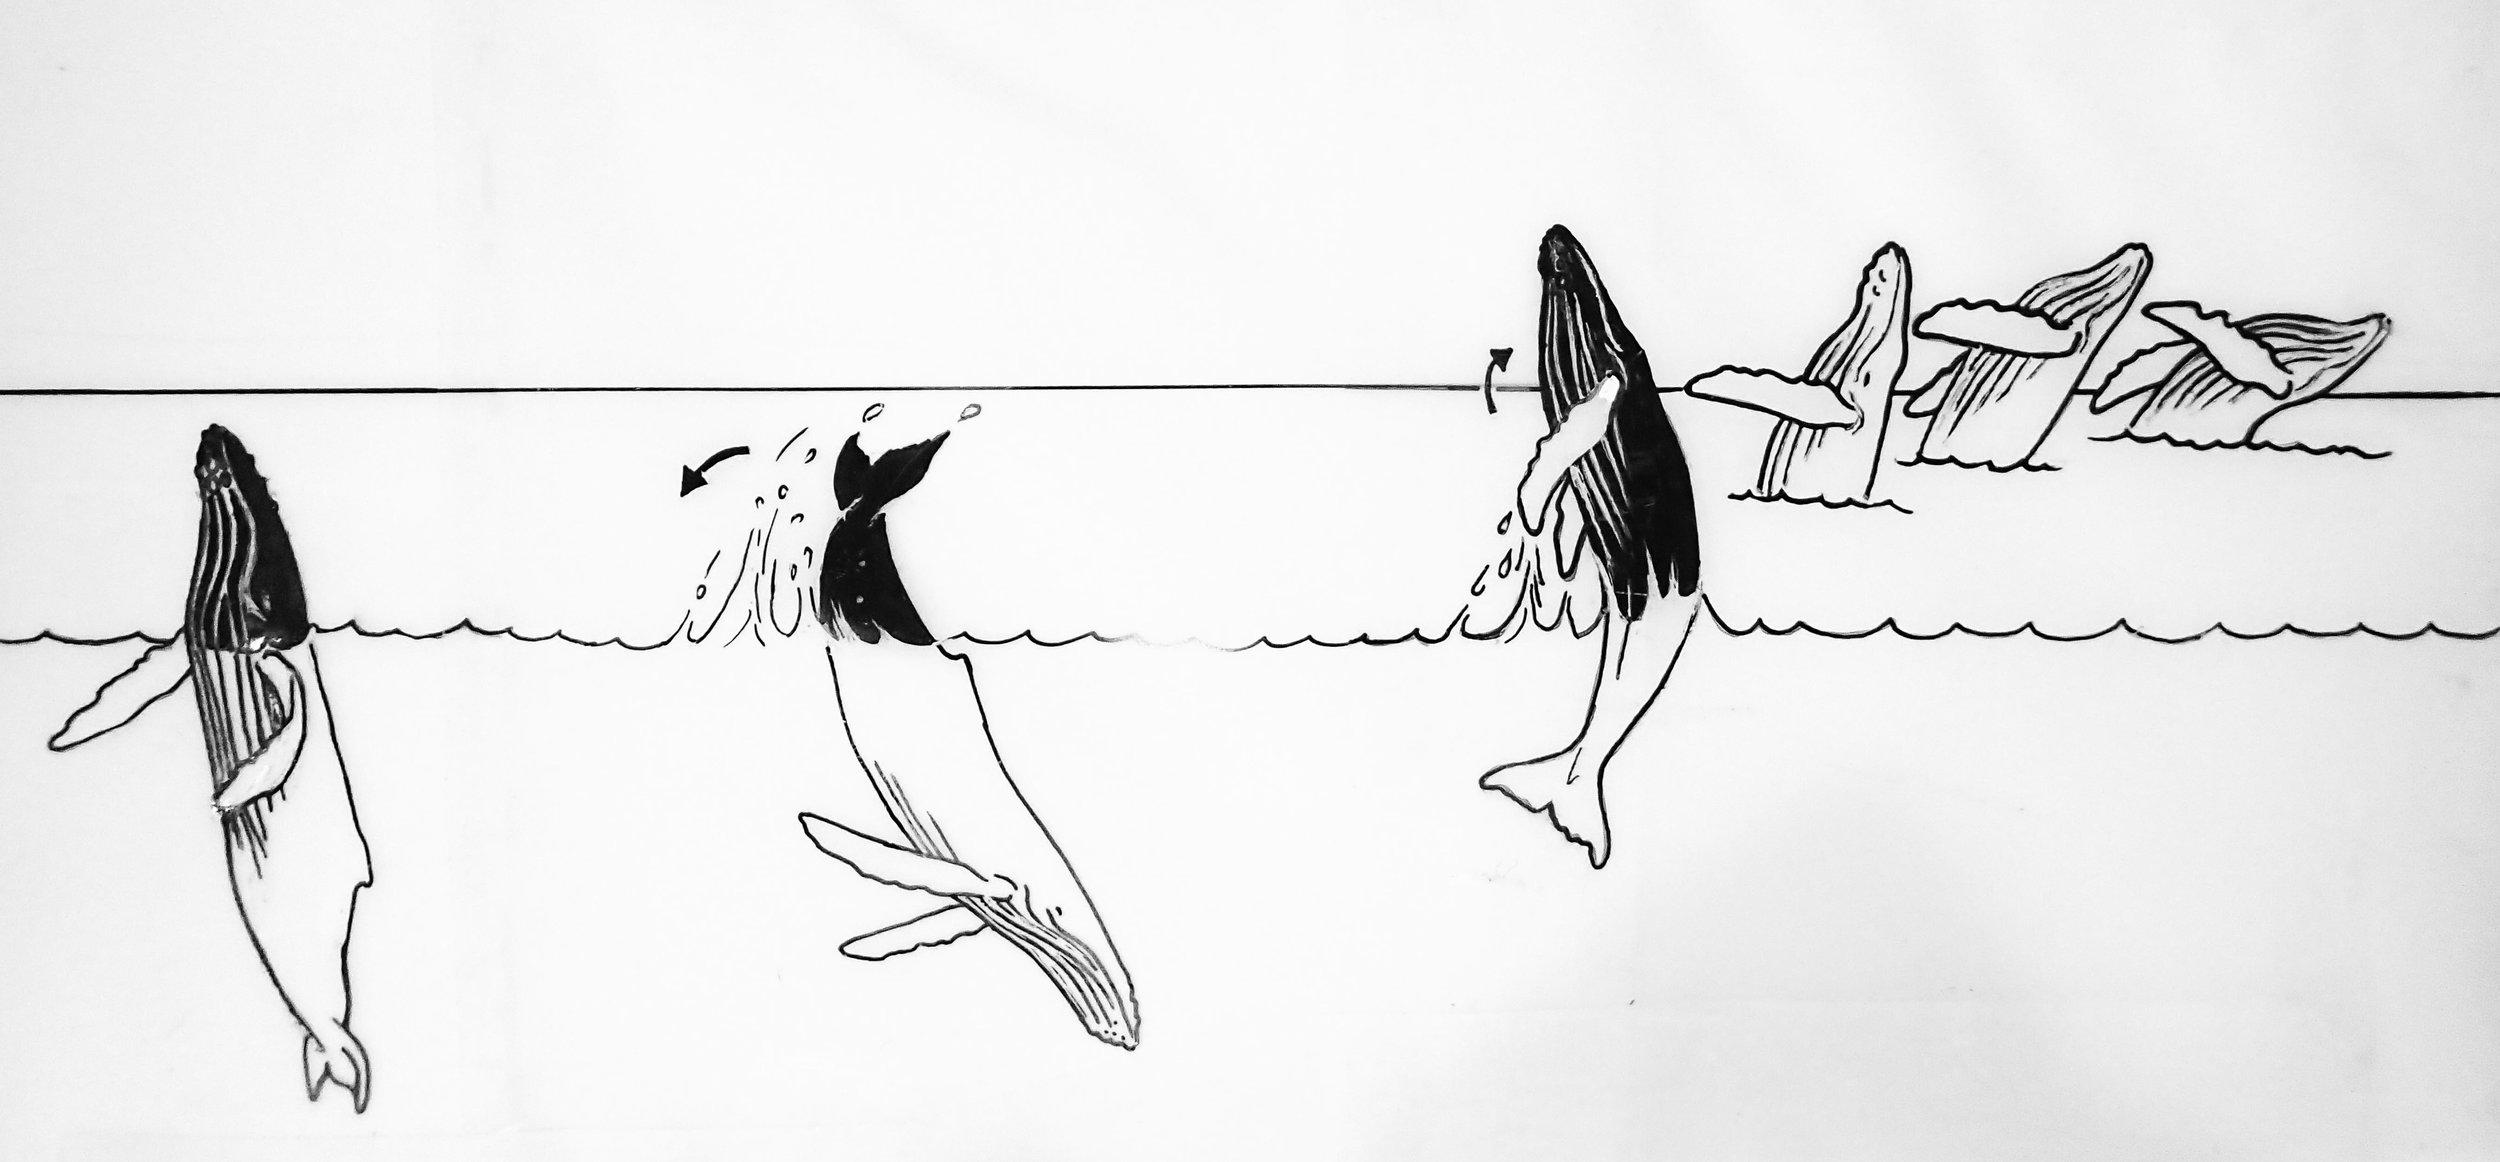 Humpback Whale Illustration Beth-Ann-Mathews-135.jpg